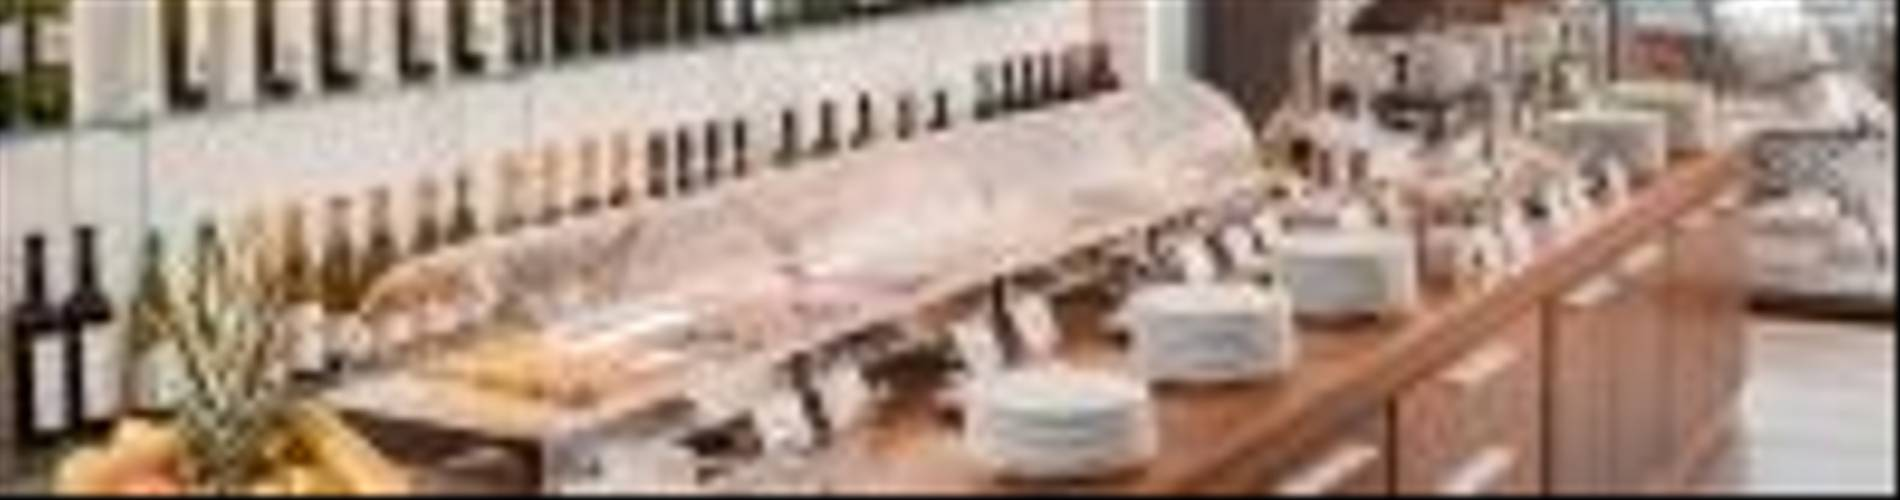 HotelResidence_DIOKLECIJAN_restaurant-breakfast_2048px_DSC04370-198x120.jpg